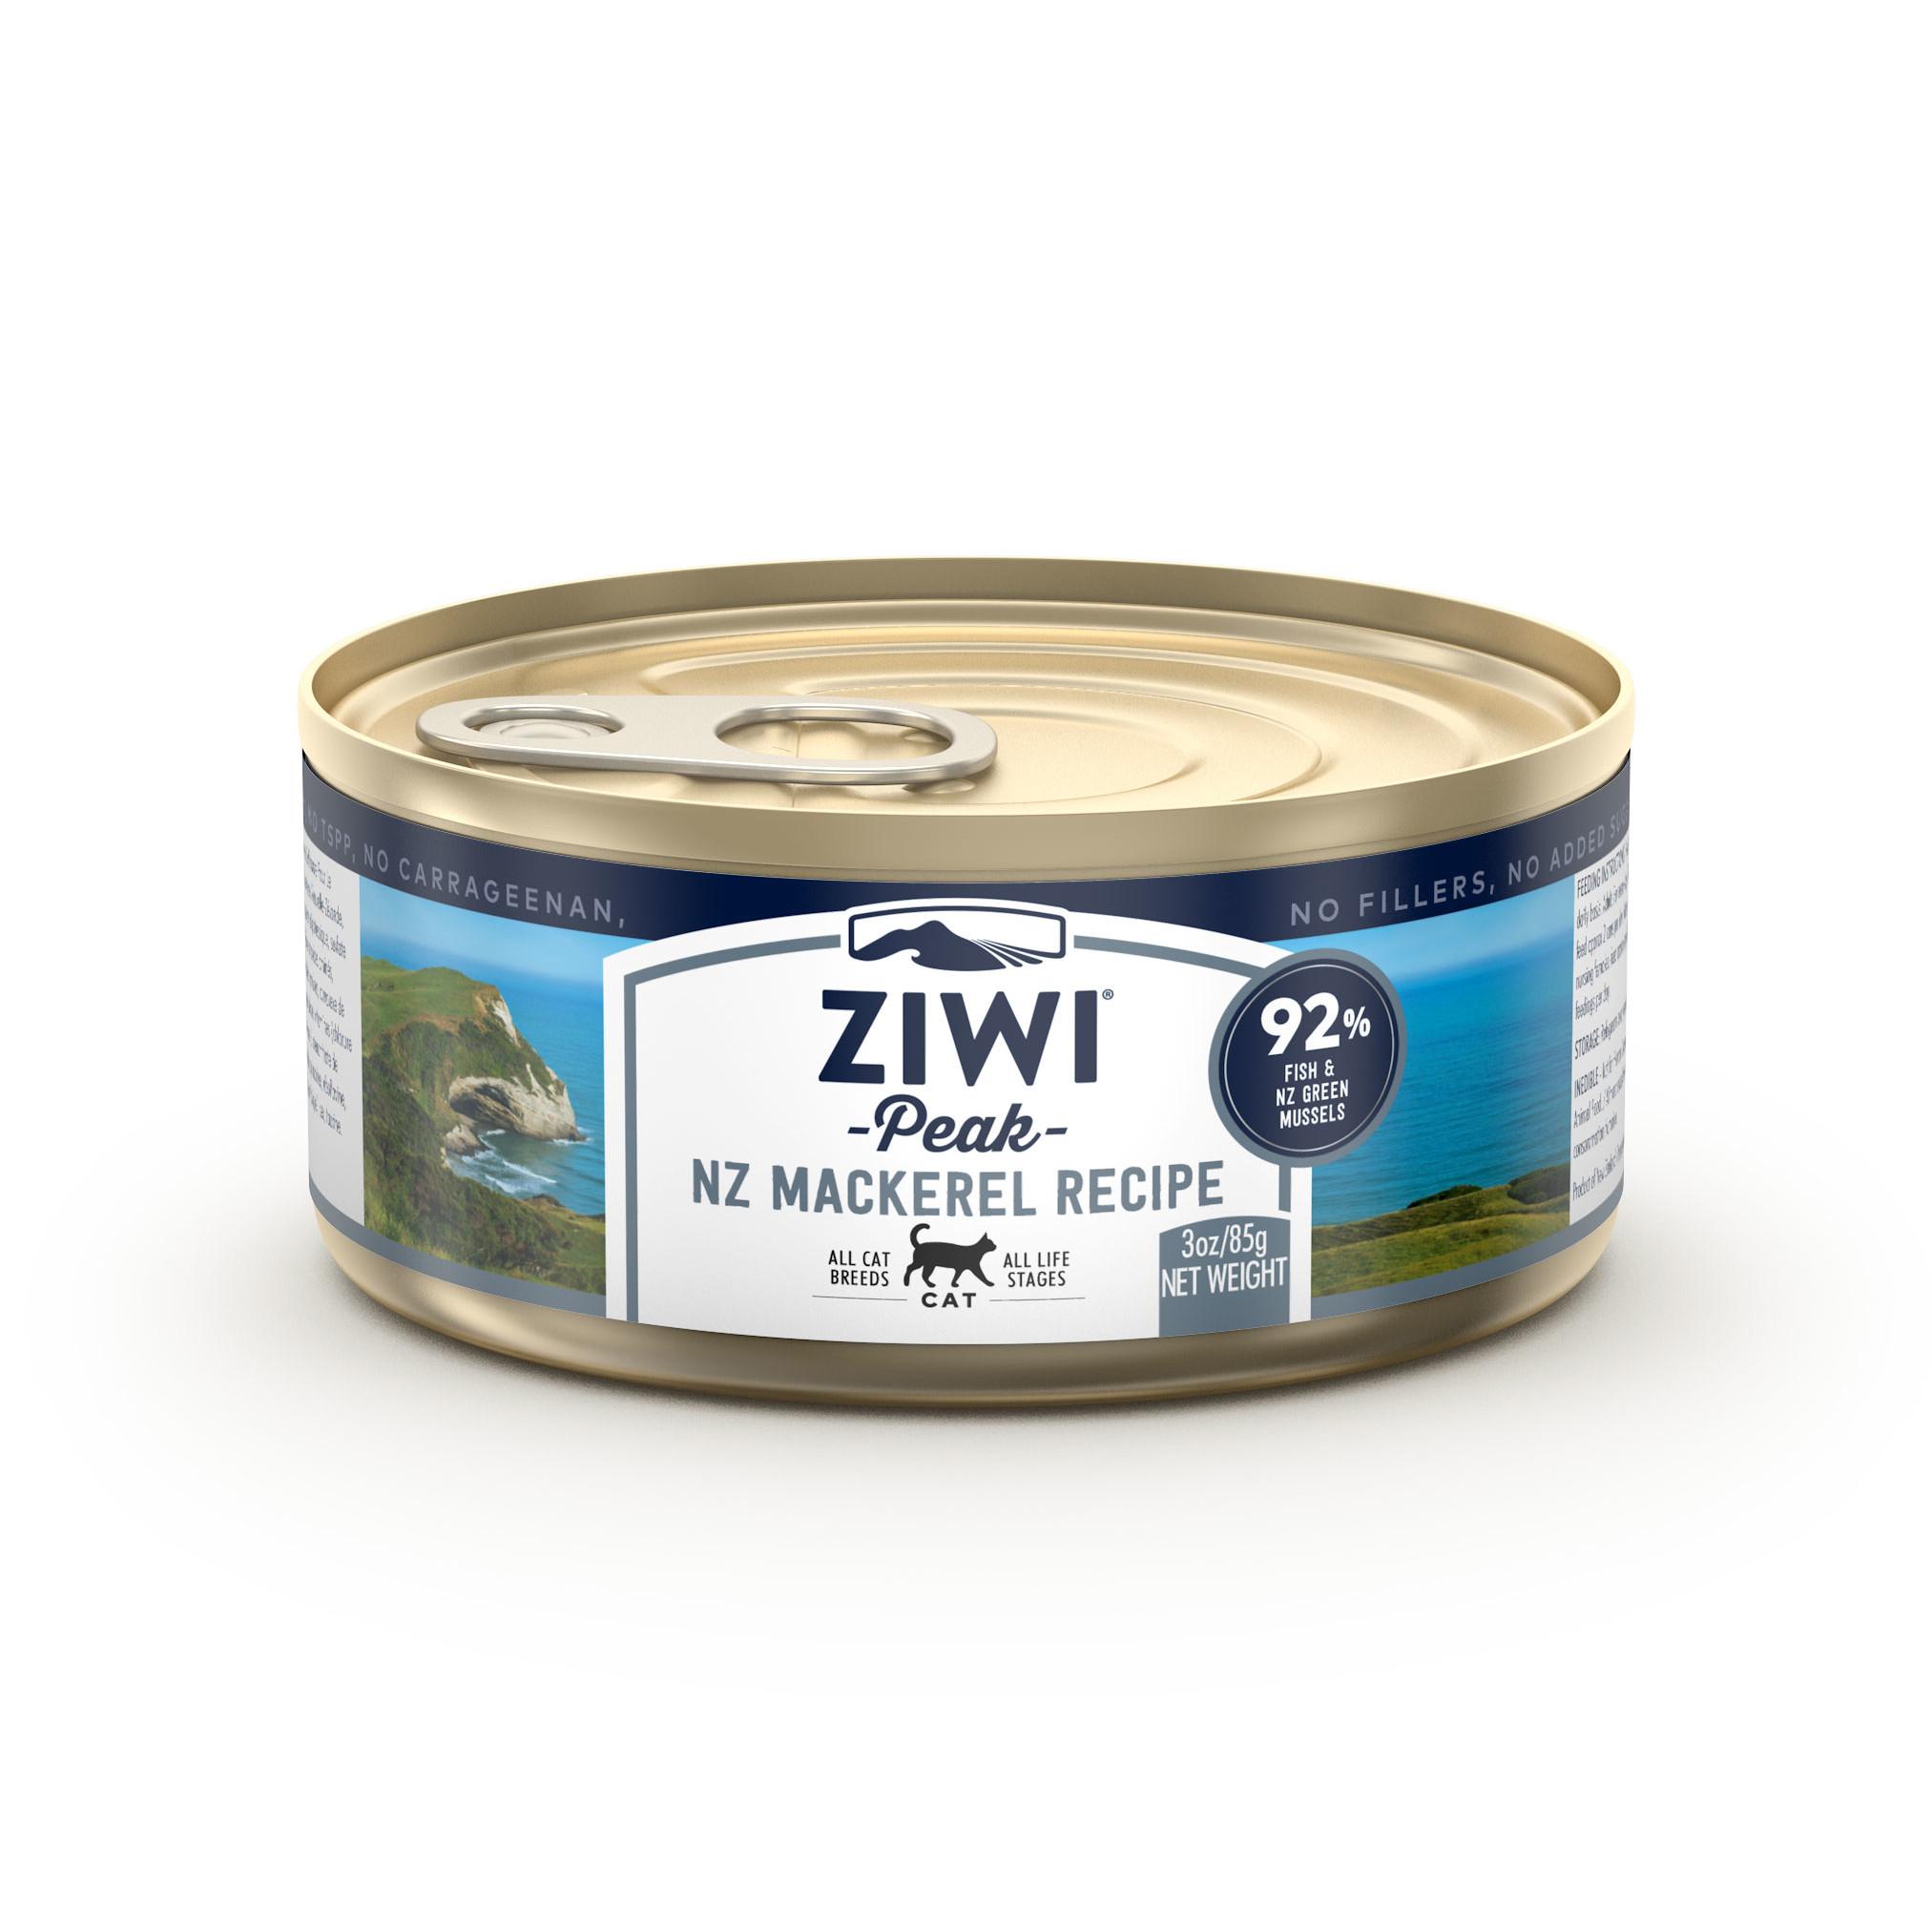 ZIWI Peak Canned Cat Food Mackerel Recipe, 3-oz|85.2-g